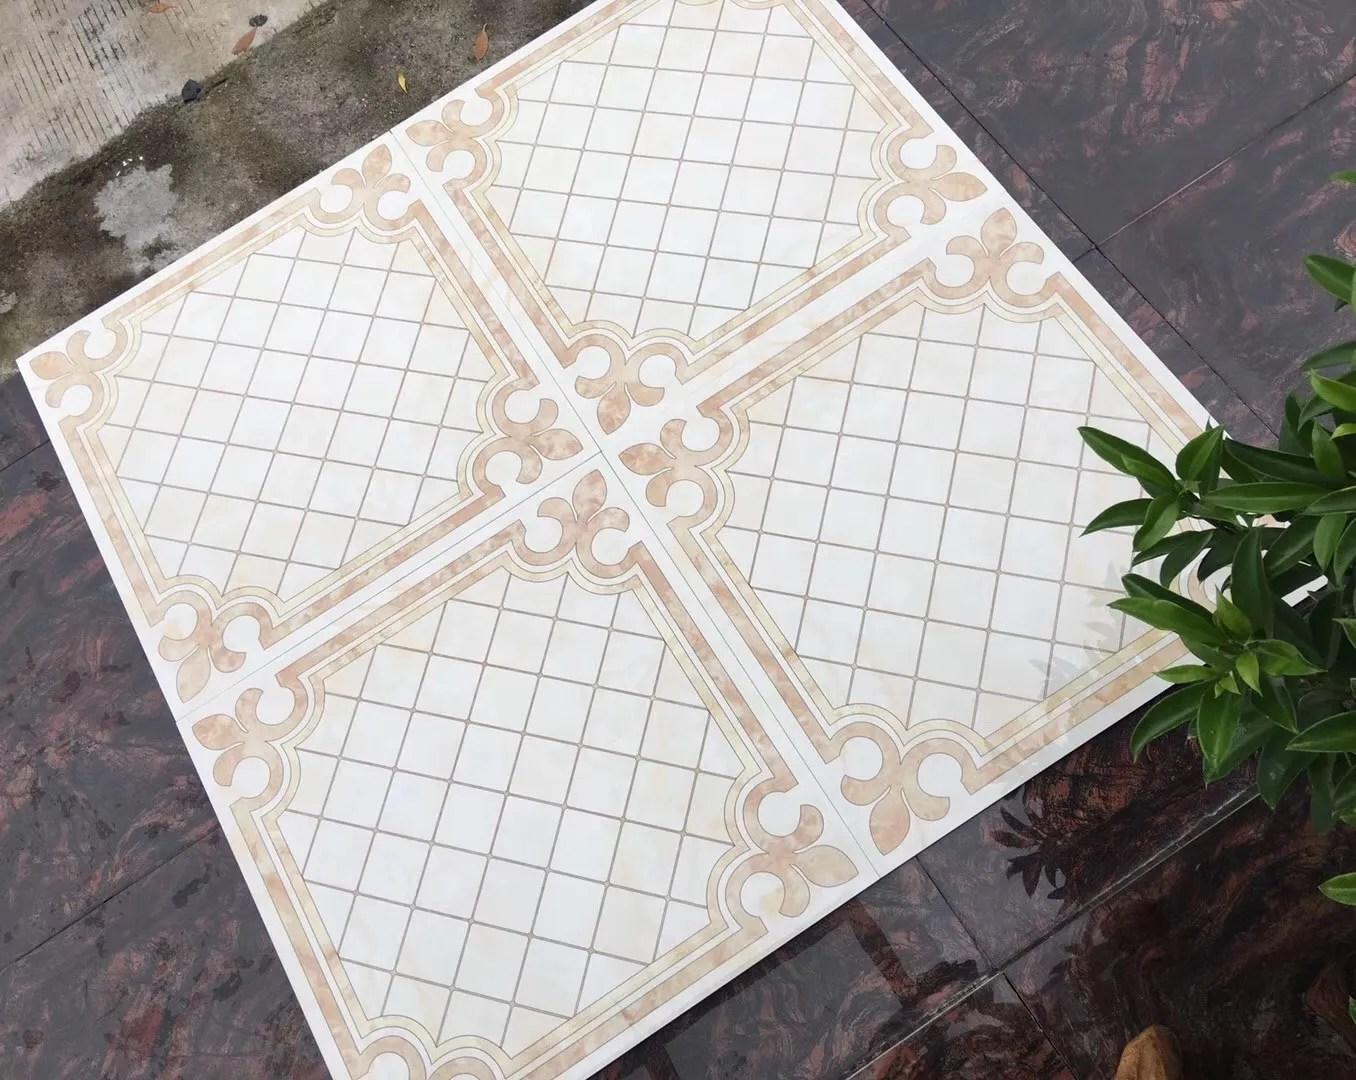 diamond glazed ceramic tile floor pattern medallions floor tiles buy pattern medallion floor tiles ceramic tile floor medallions tile floor